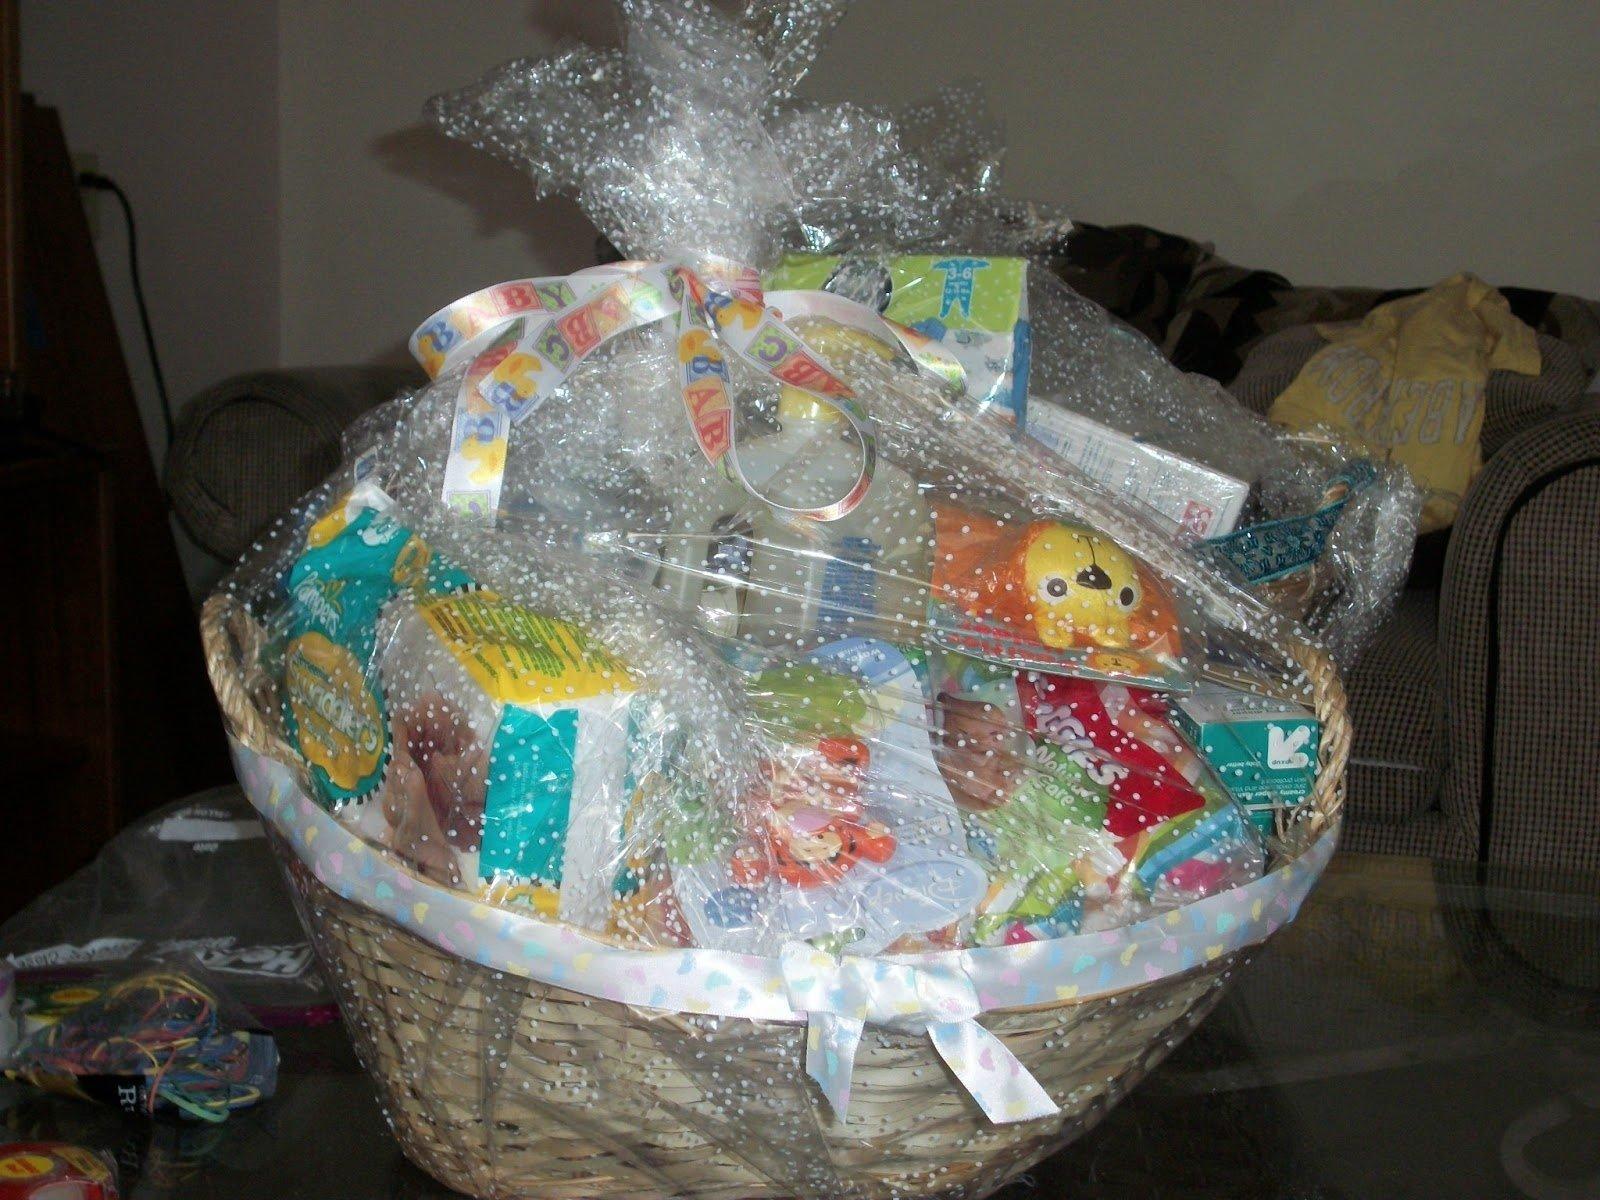 10 Stunning Baby Shower Gift Basket Ideas baby shower gift basket ideas for guests stunning 2018 stock photos